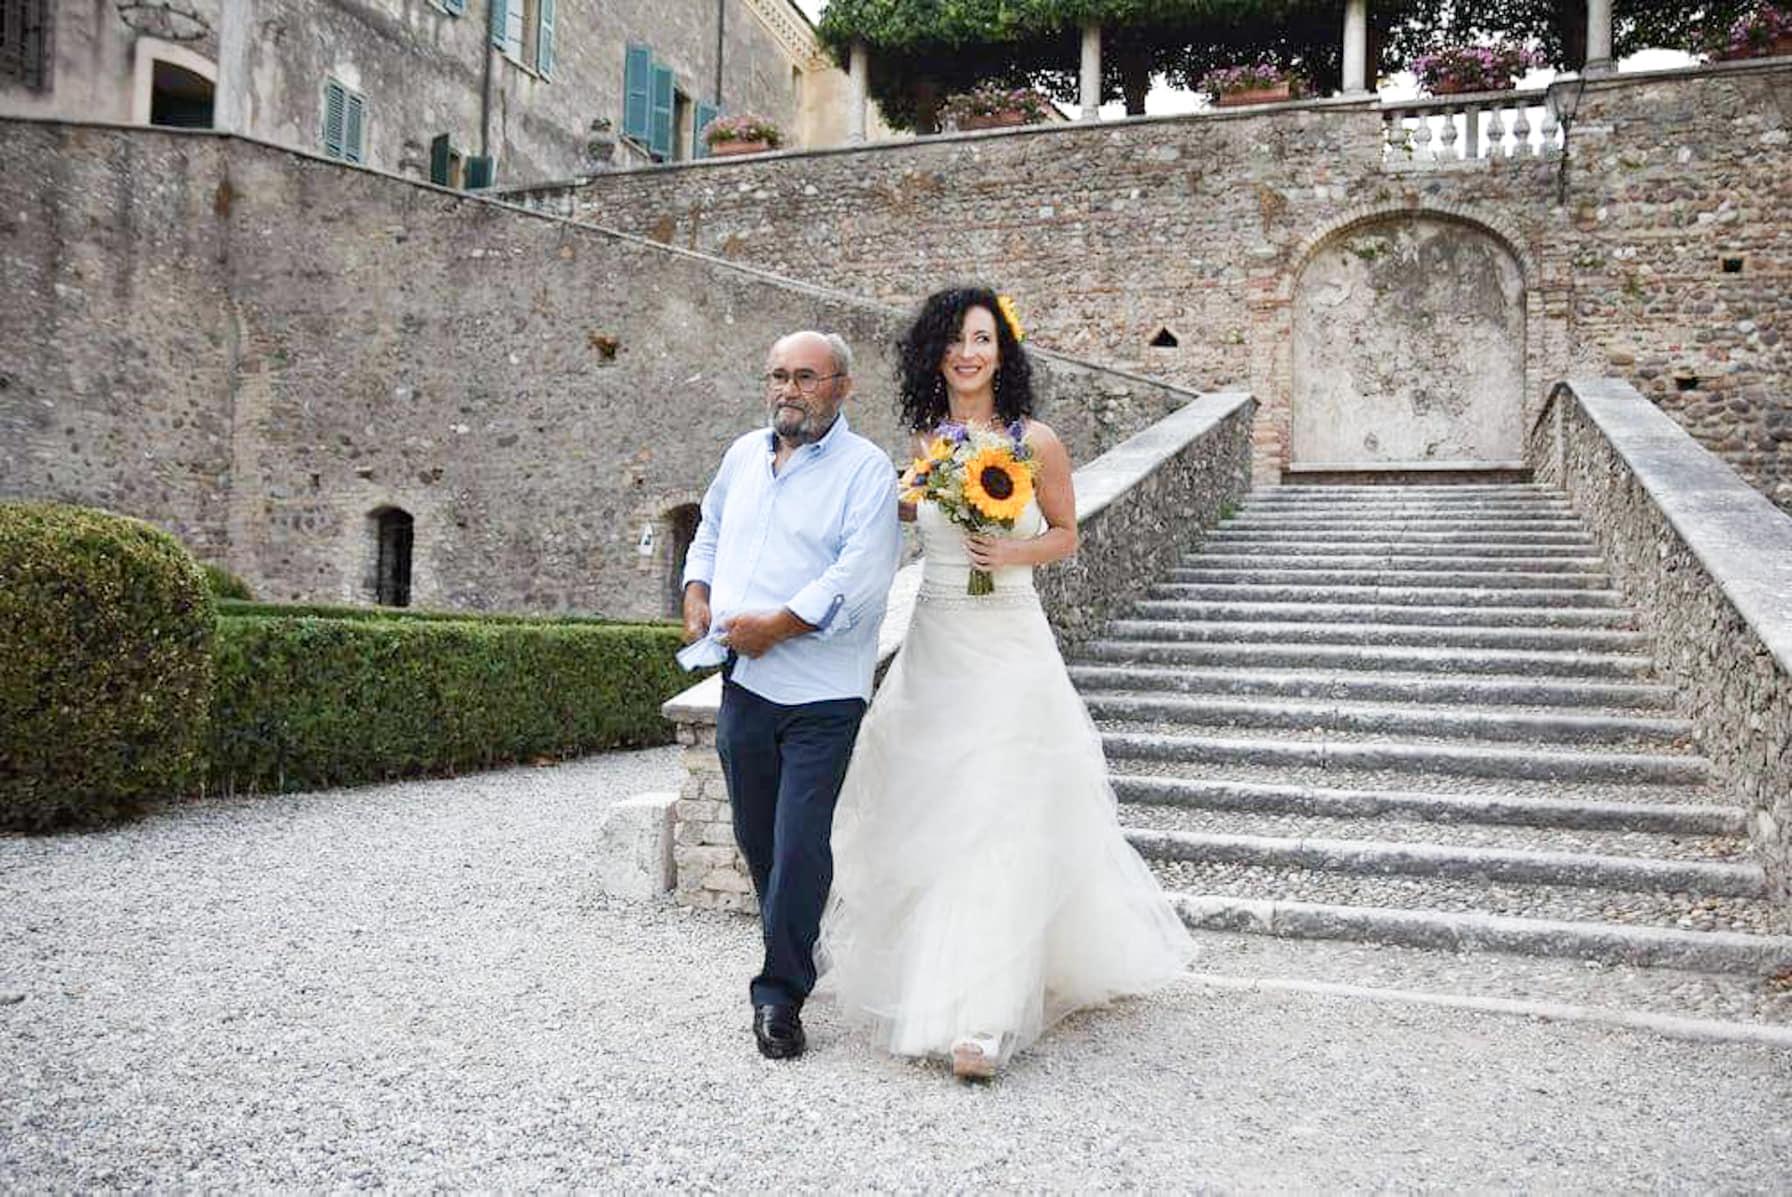 Cerimonia civile matrimonio semplice in giardino